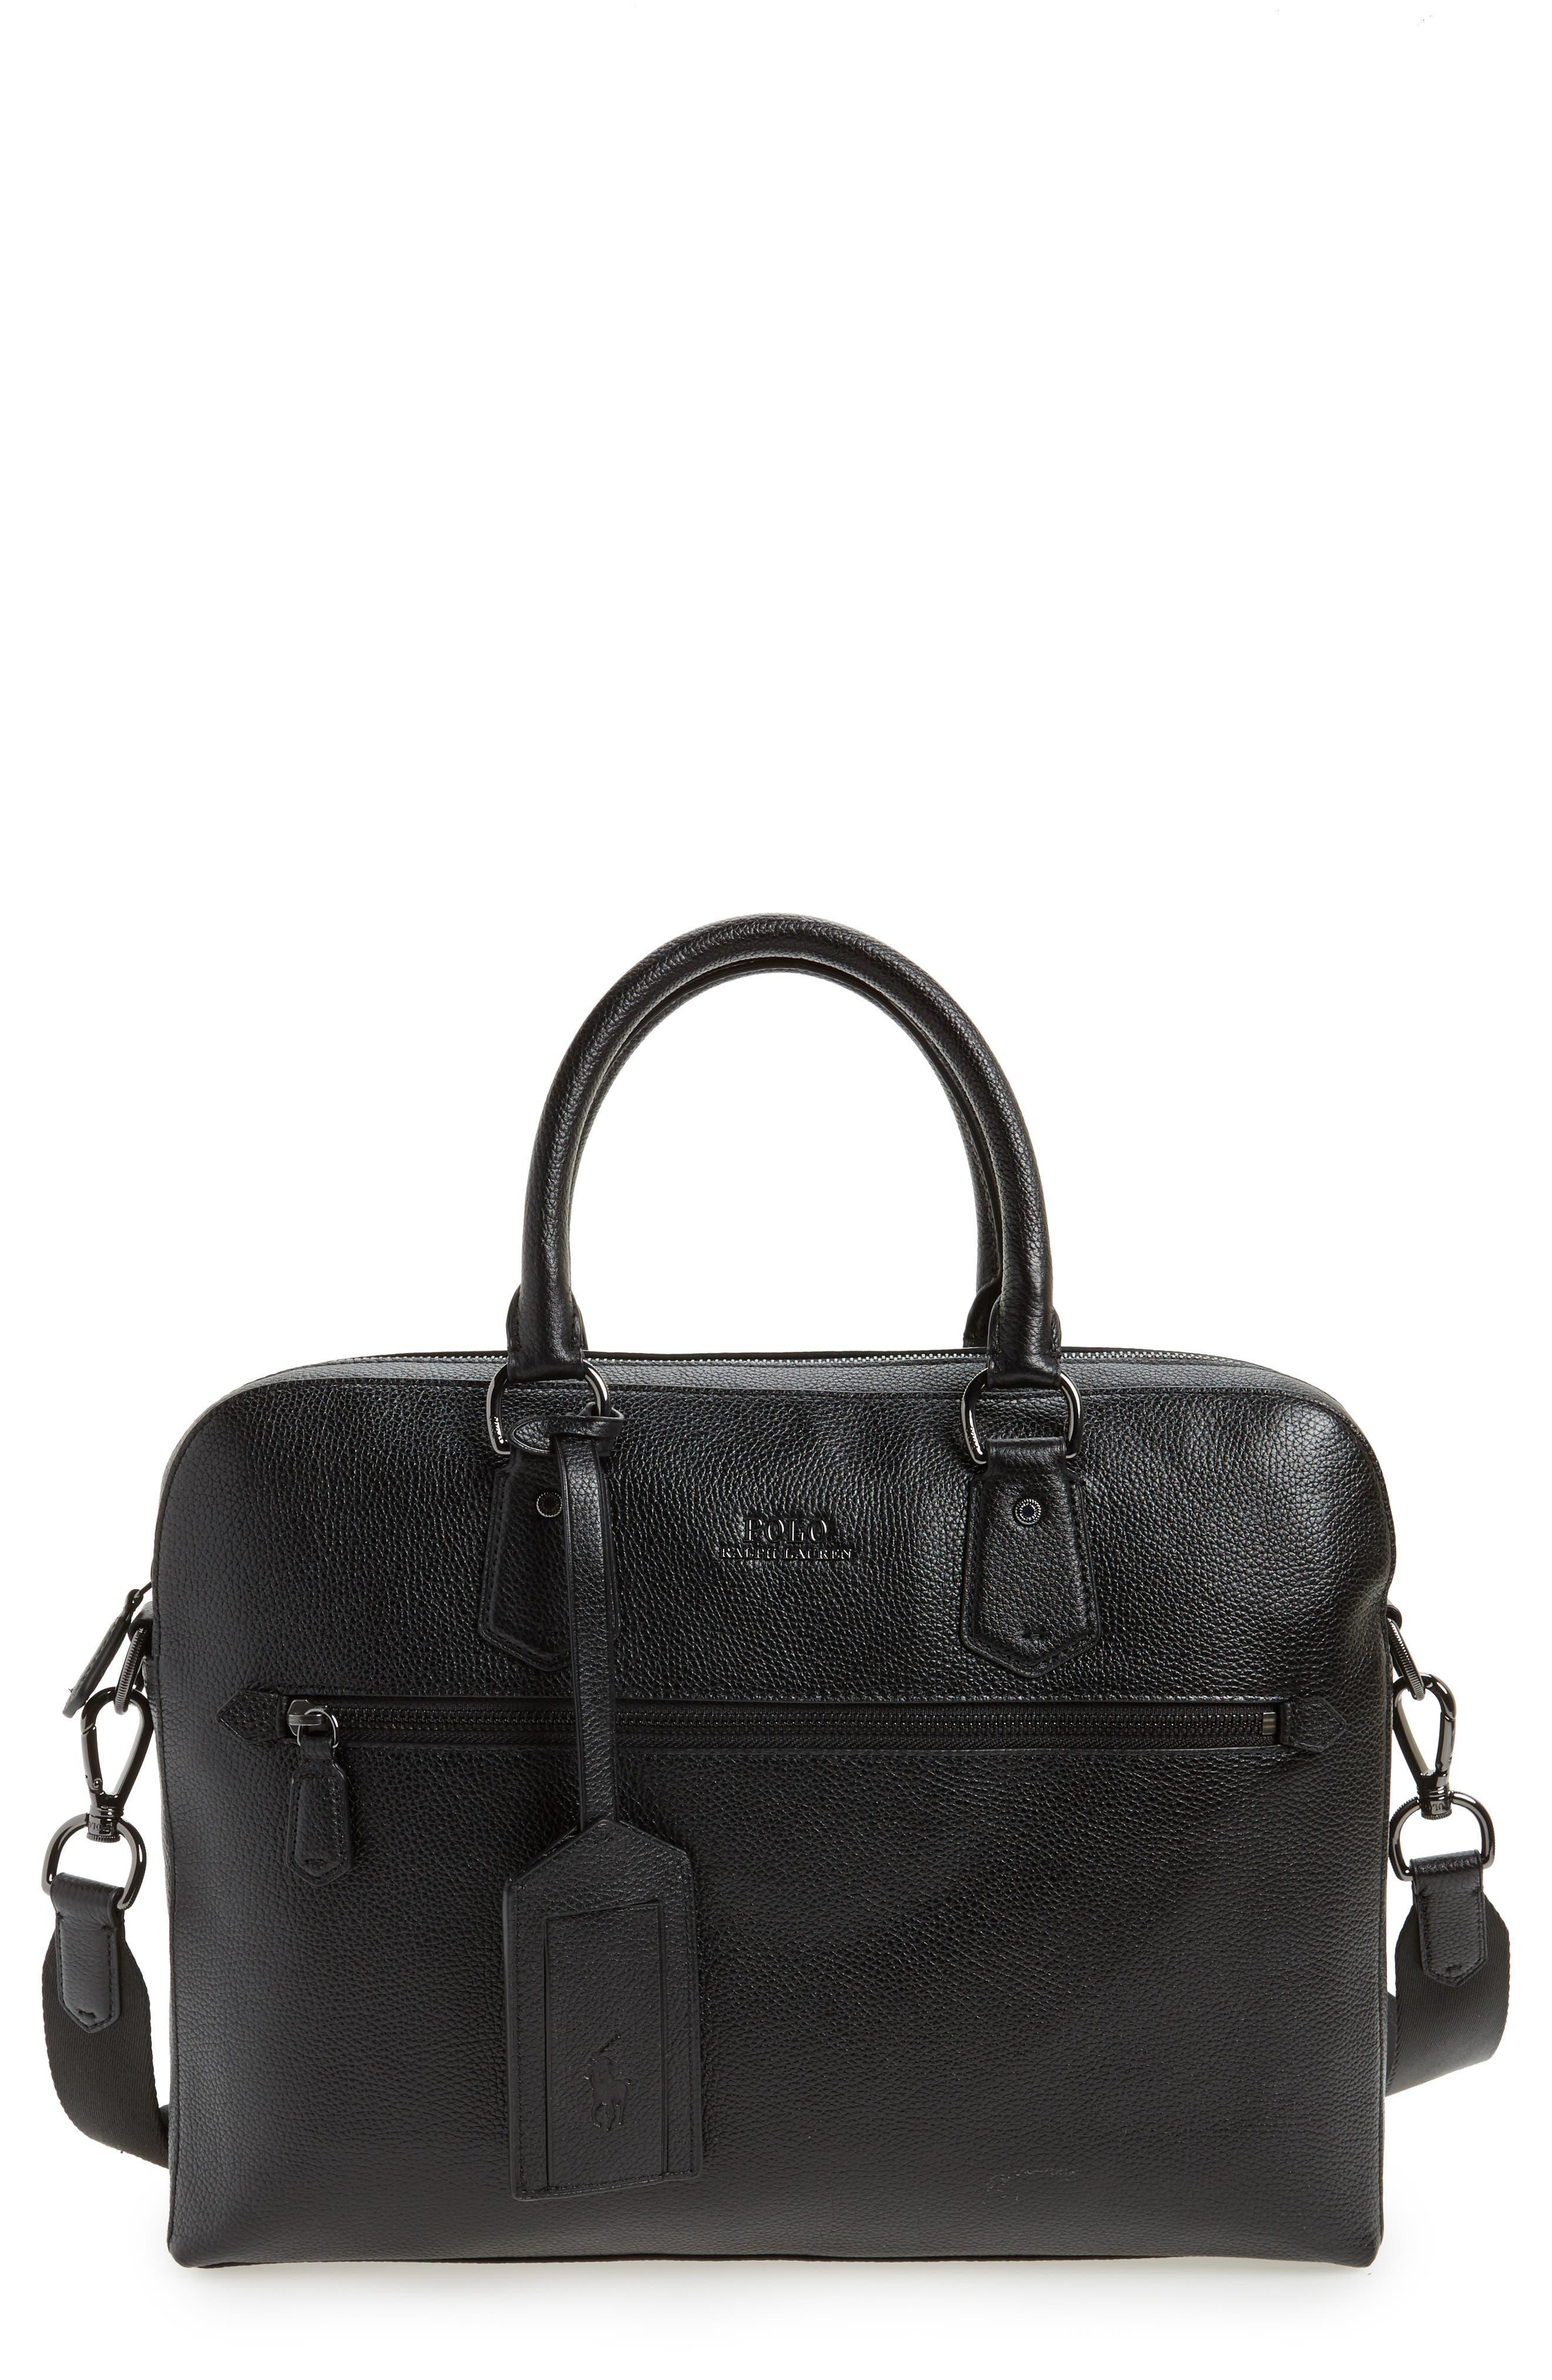 Polo Ralph Lauren Commuter Leather Briefcase